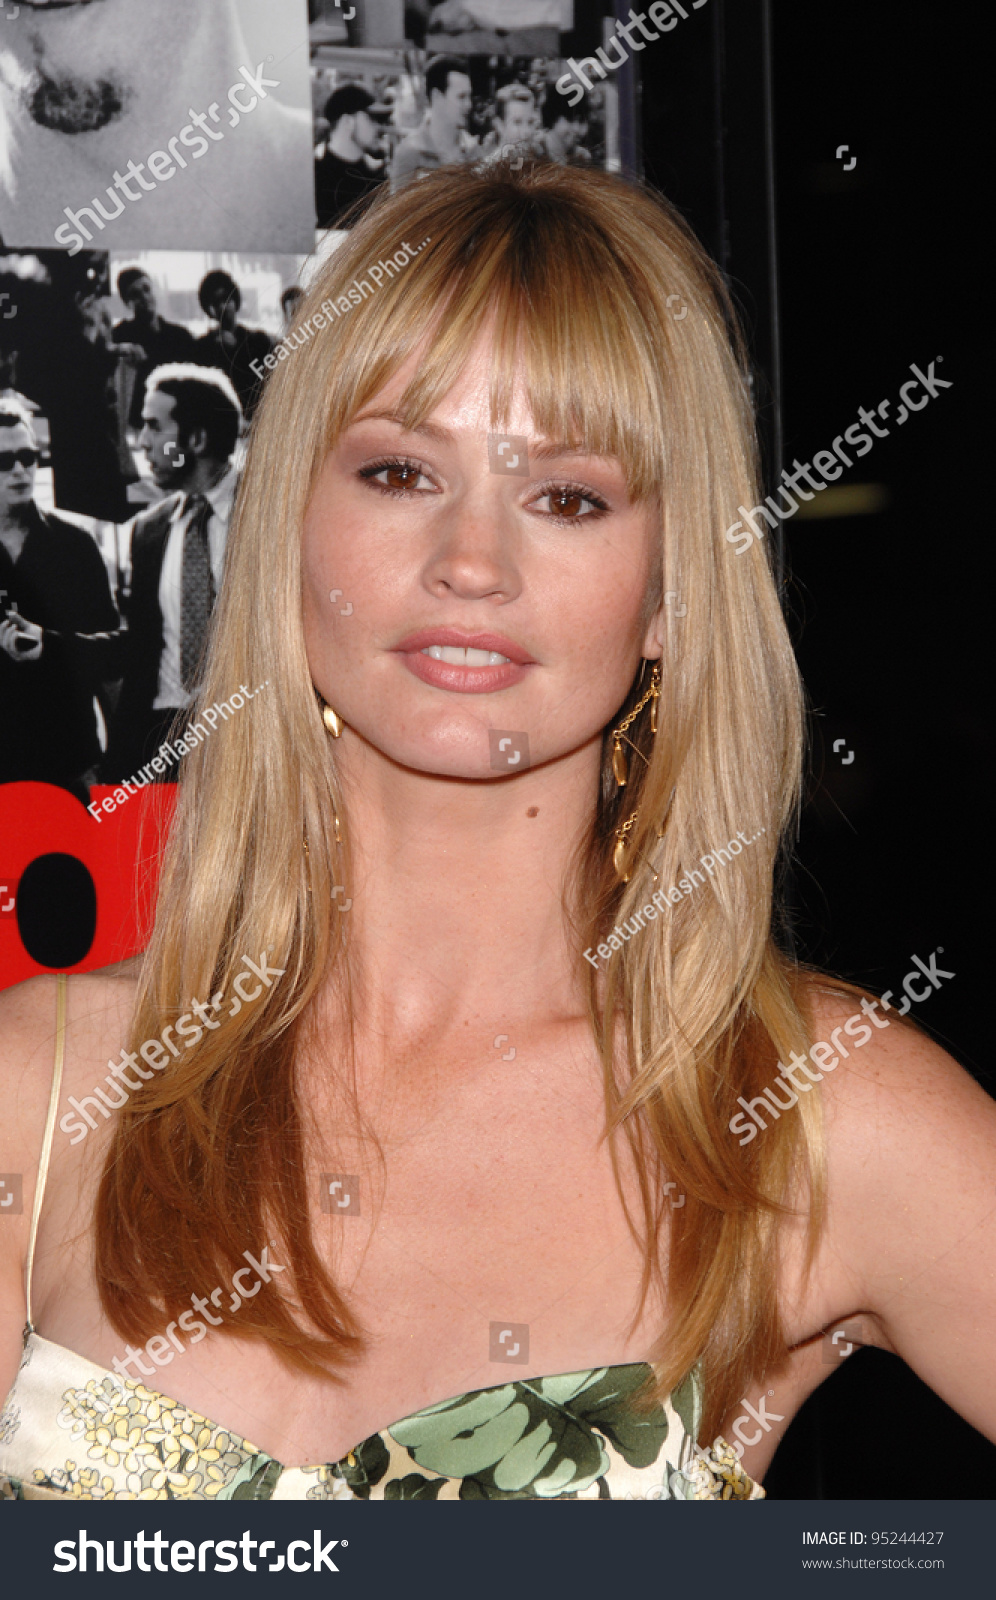 Jodie-Amy Rivera